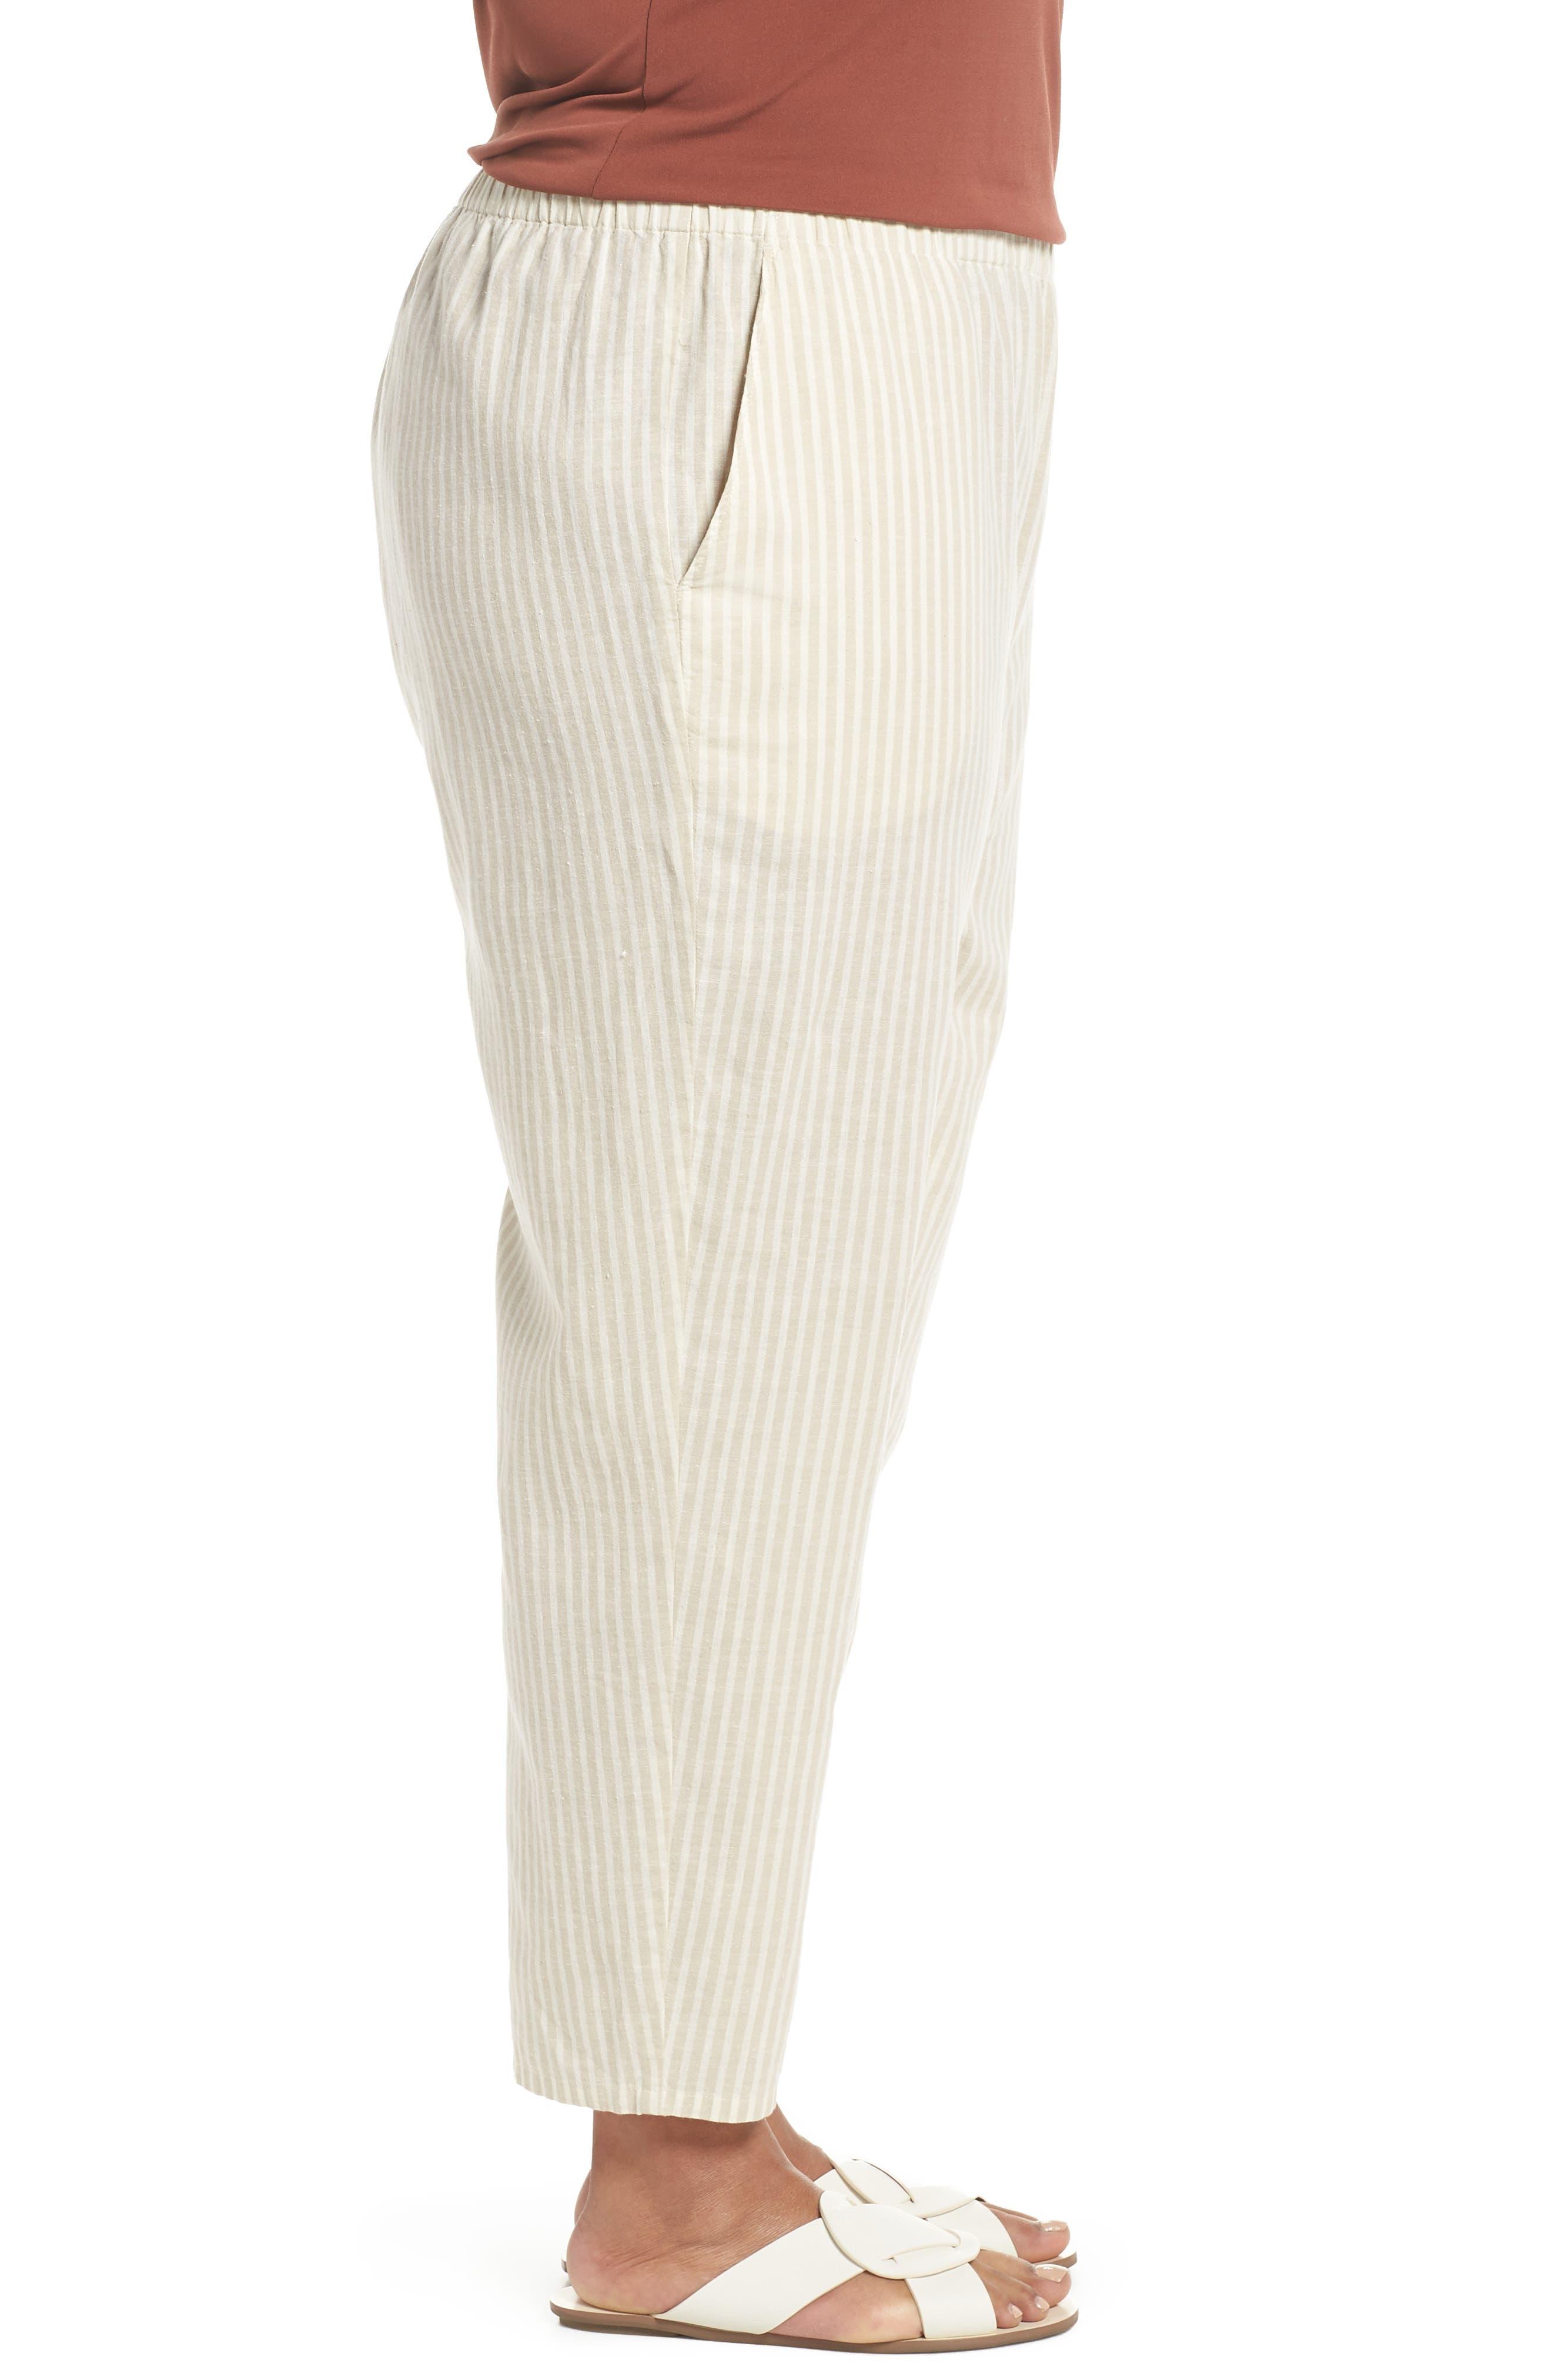 Stripe Ankle Hemp & Cotton Pants,                             Alternate thumbnail 3, color,                             Natural